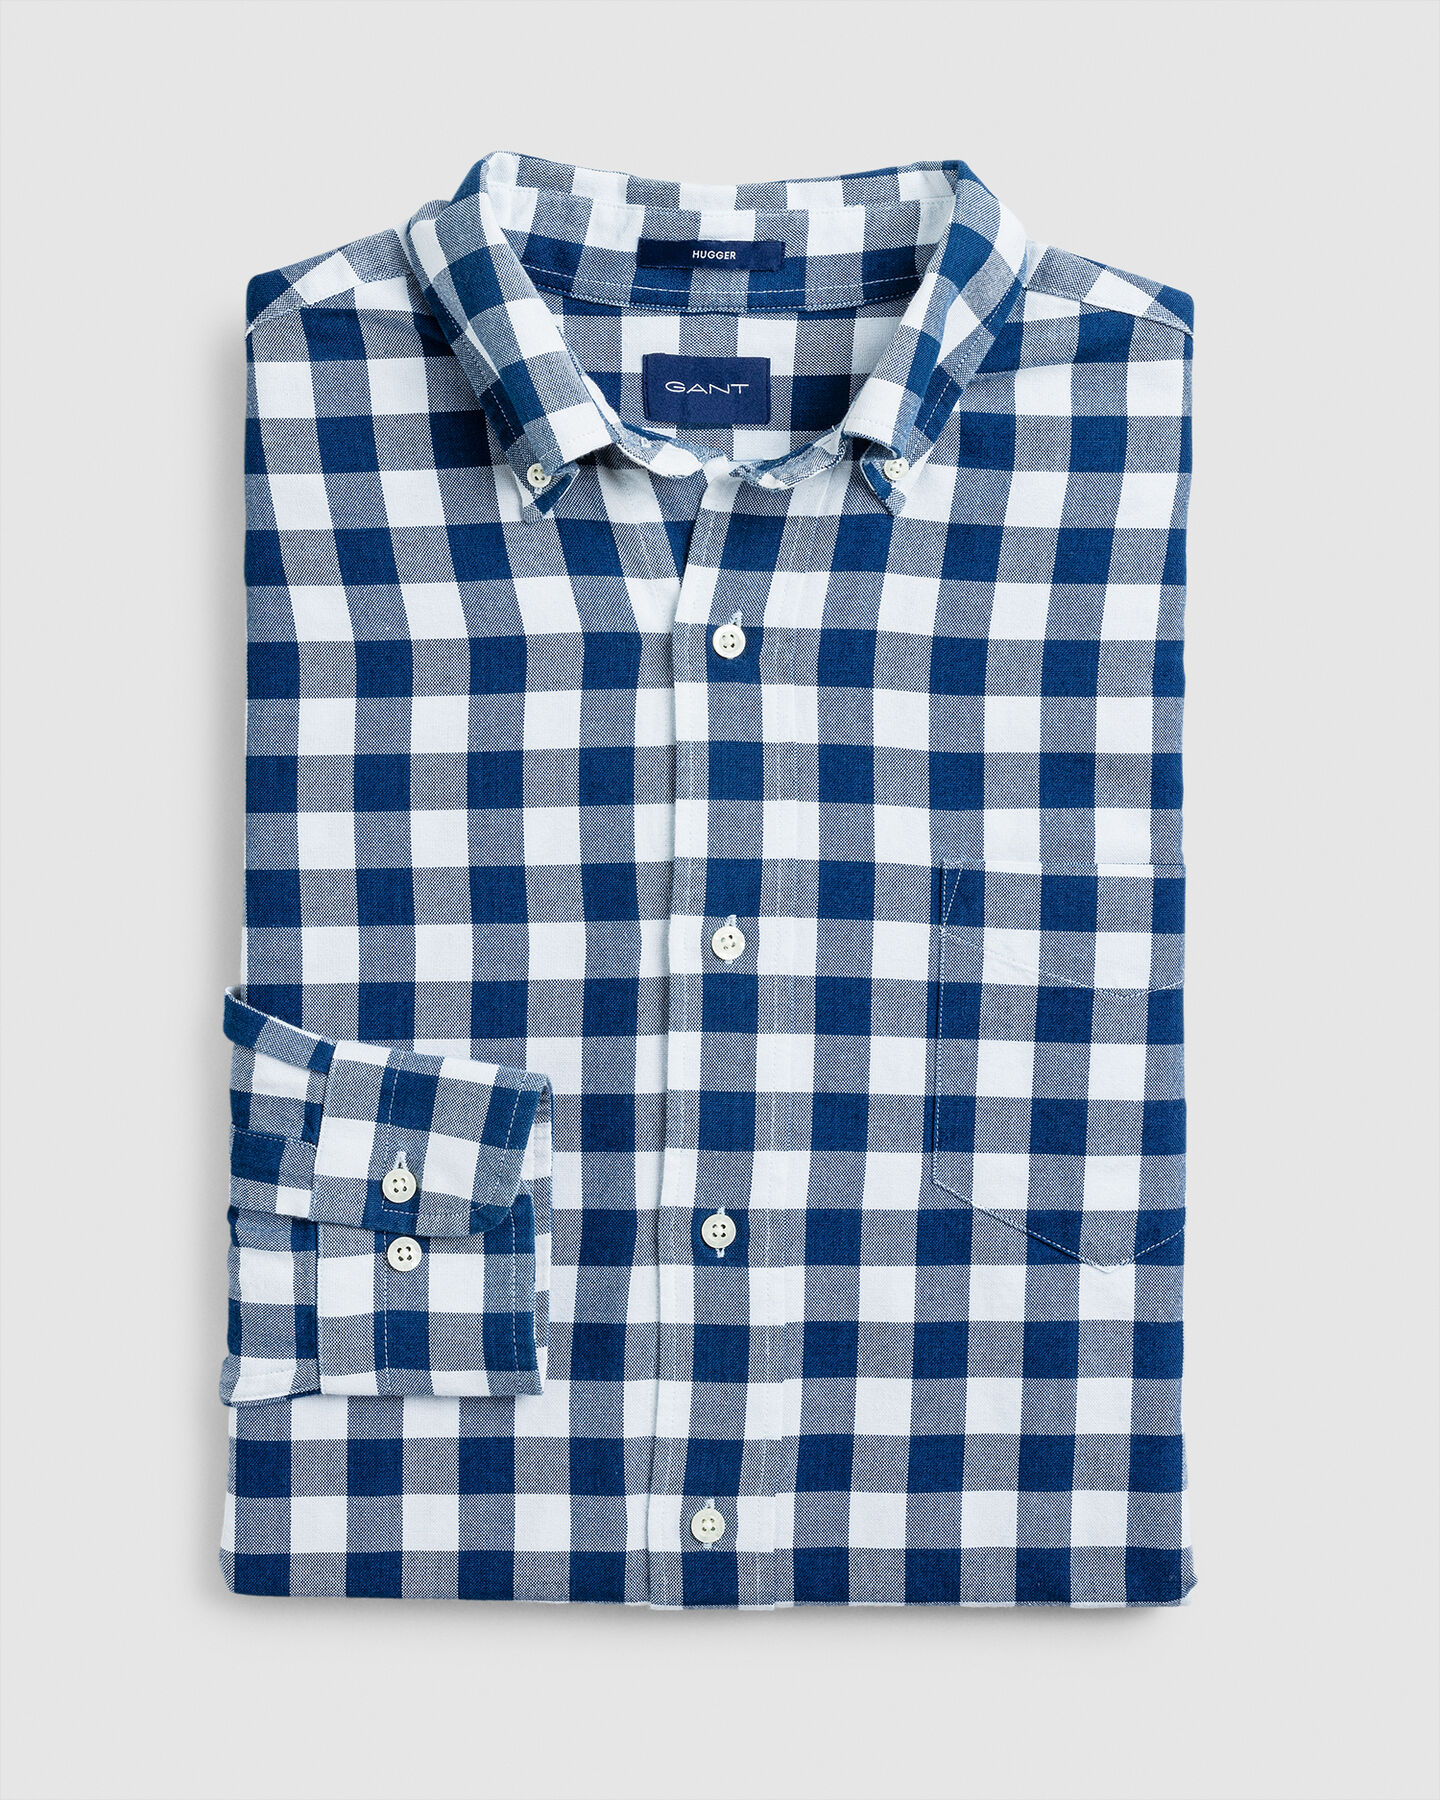 Indigoblaues Hugger-Fit Oxford-Hemd im Vichy-Karo